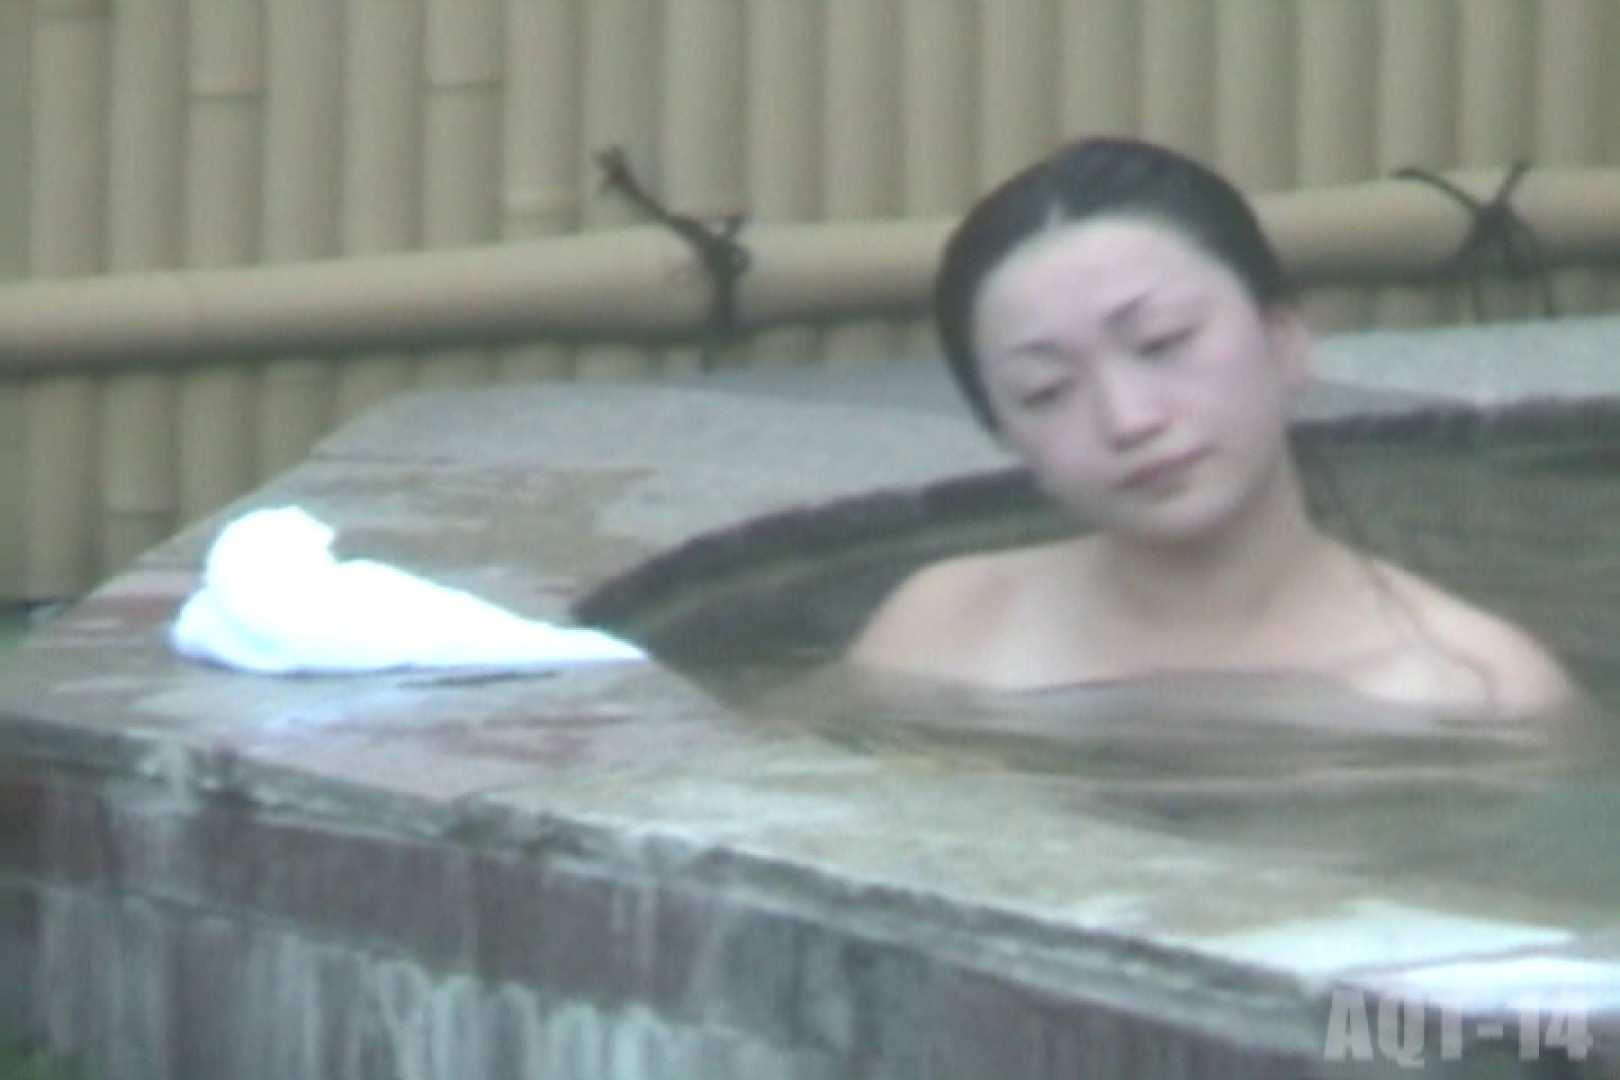 Aquaな露天風呂Vol.826 盗撮 | OLエロ画像  88PICs 37